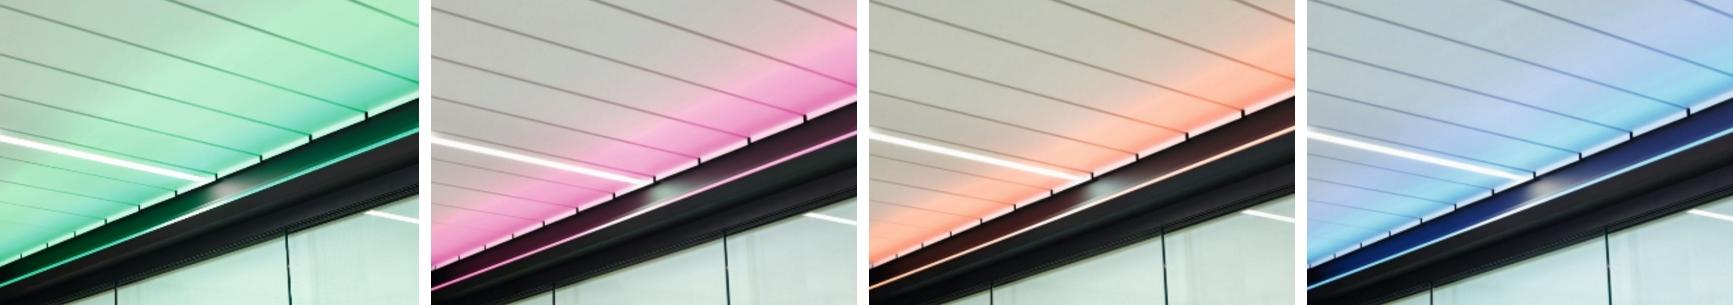 035_Pergola_Renson_Camargue_LED_svetla_pasky_barevne_varianty